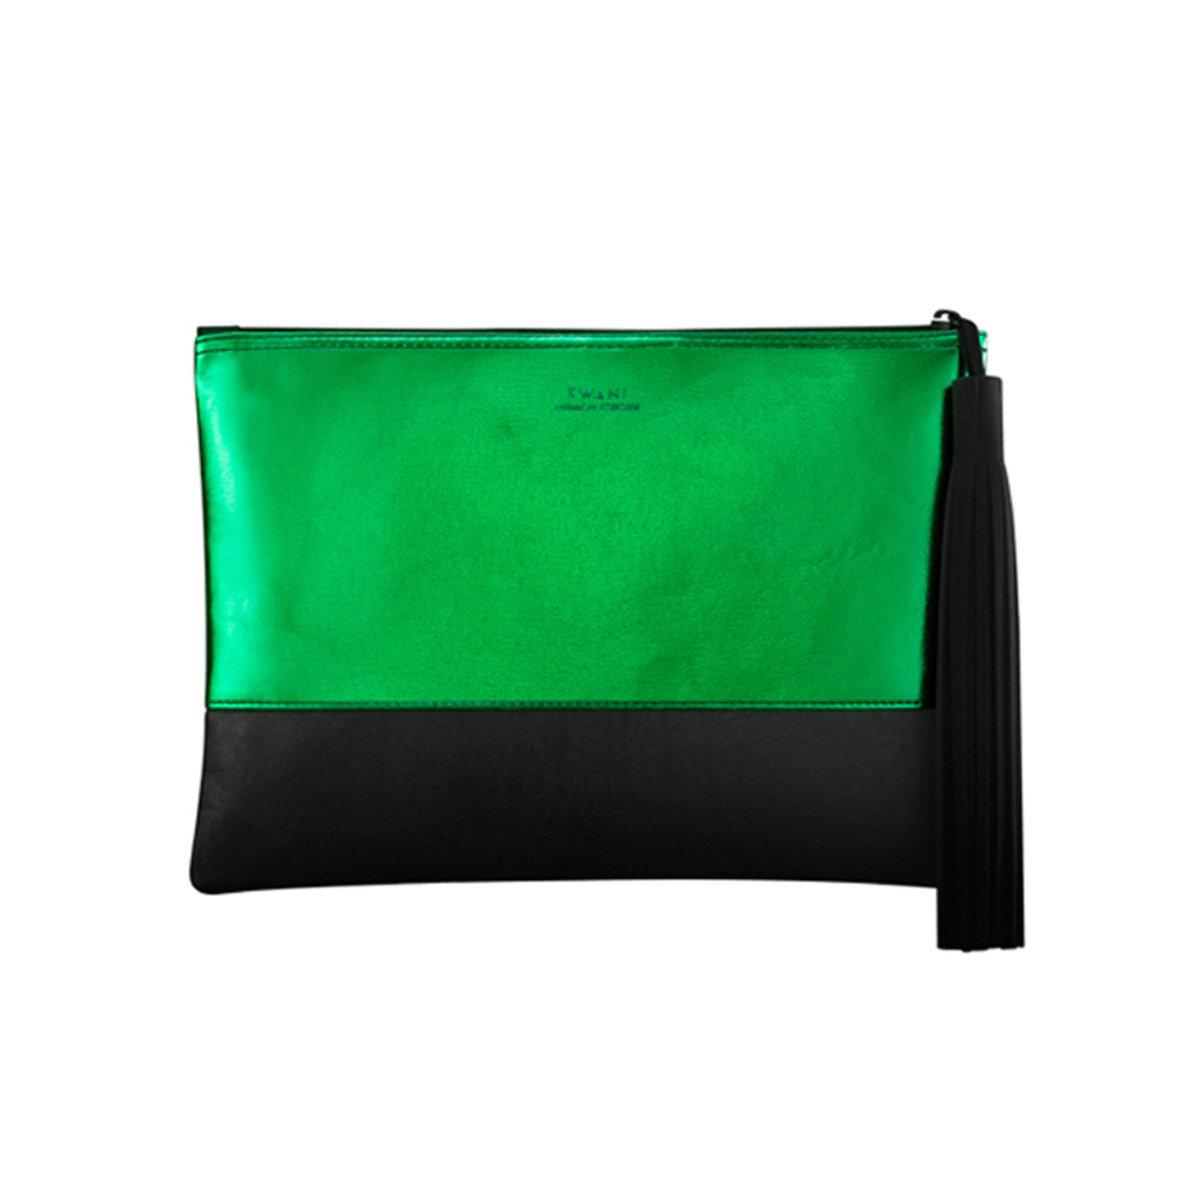 1Year 綠色流蘇手拿包